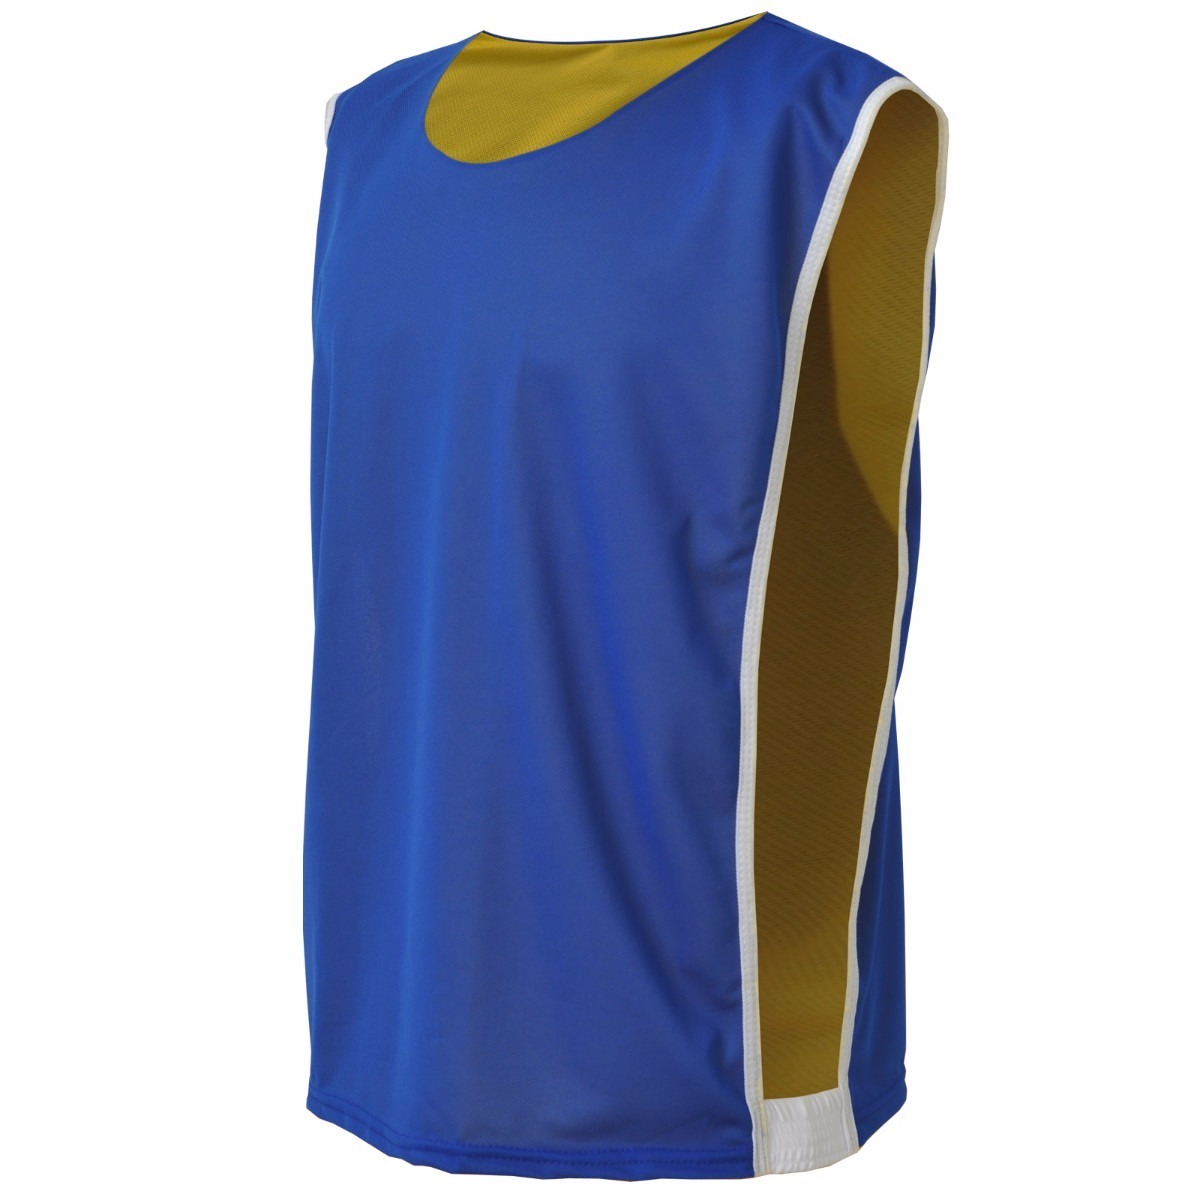 b4a41d53049ba Colete De Treino Dupla Face - Futebol basquete volei - R  14